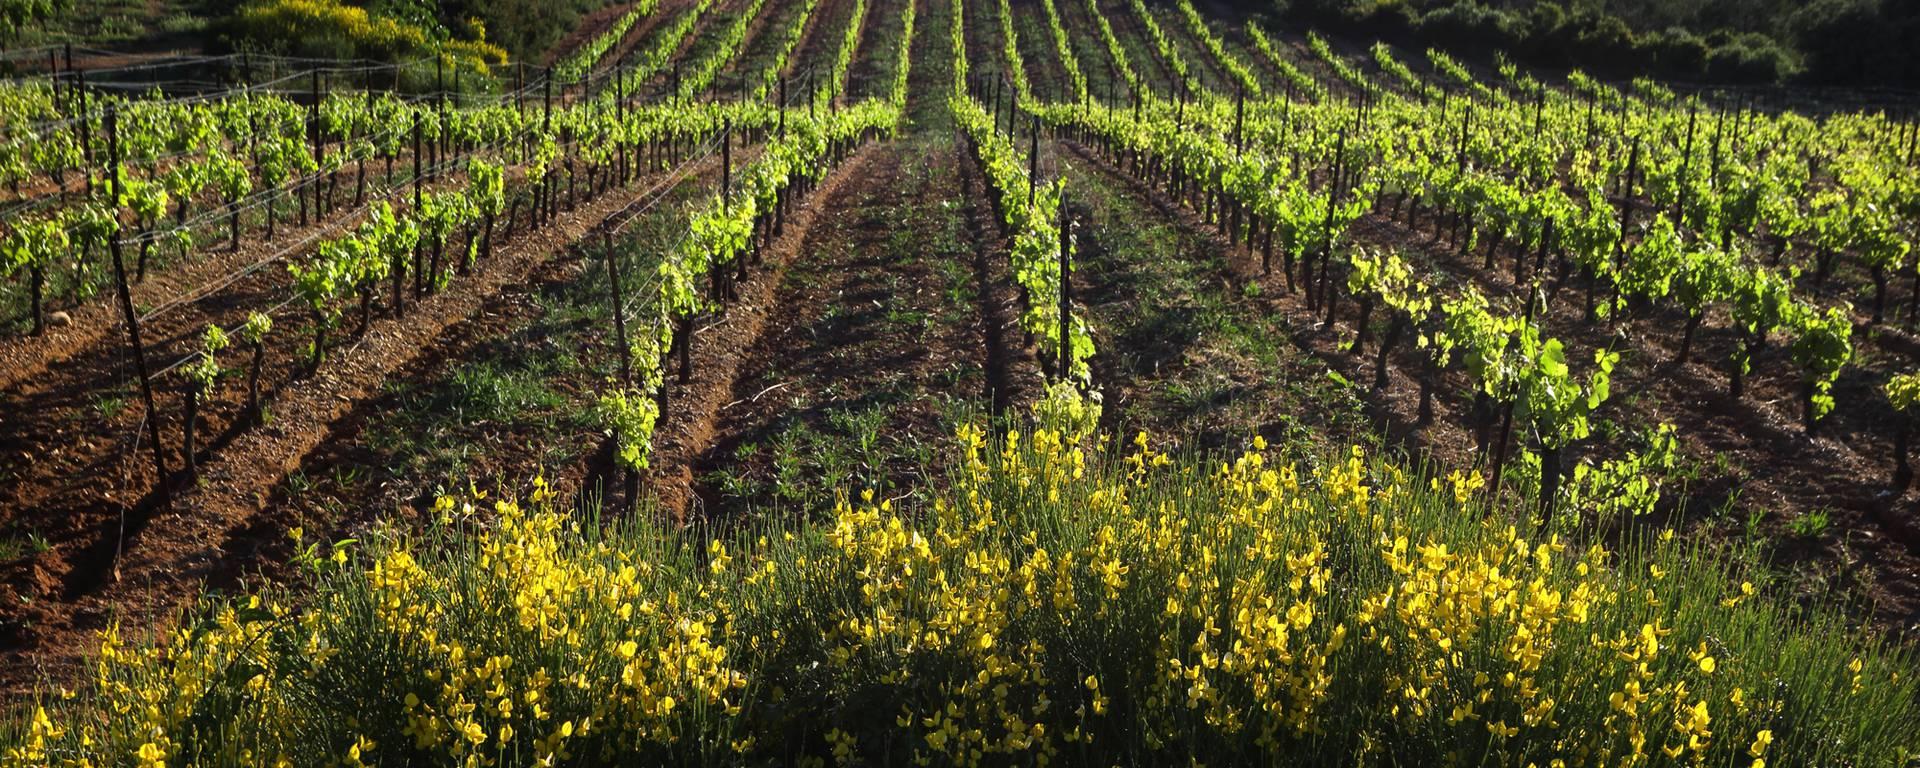 Vignobles ©G.Souche